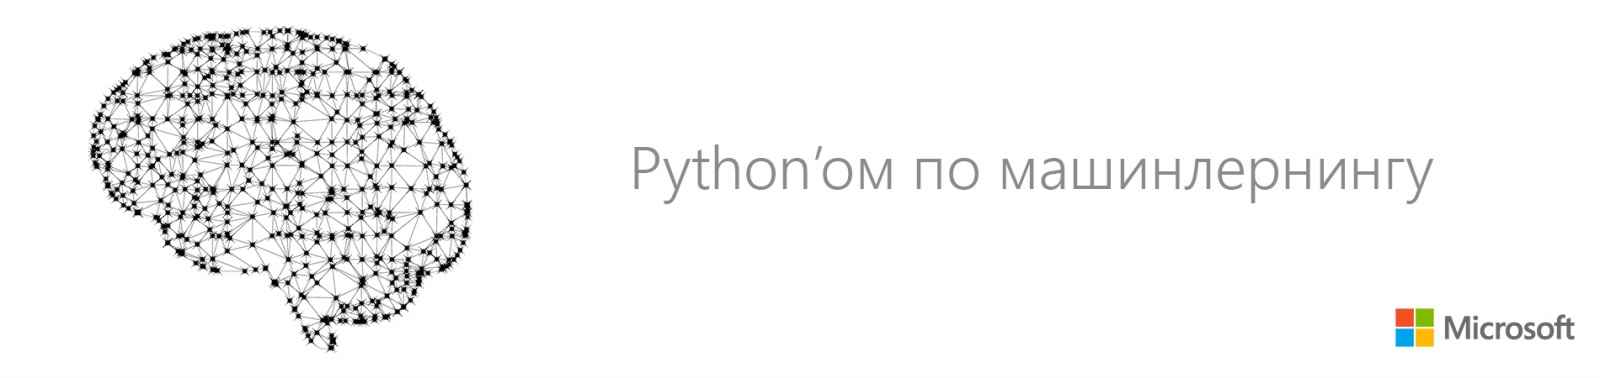 Python'ом по машинлернингу - 1